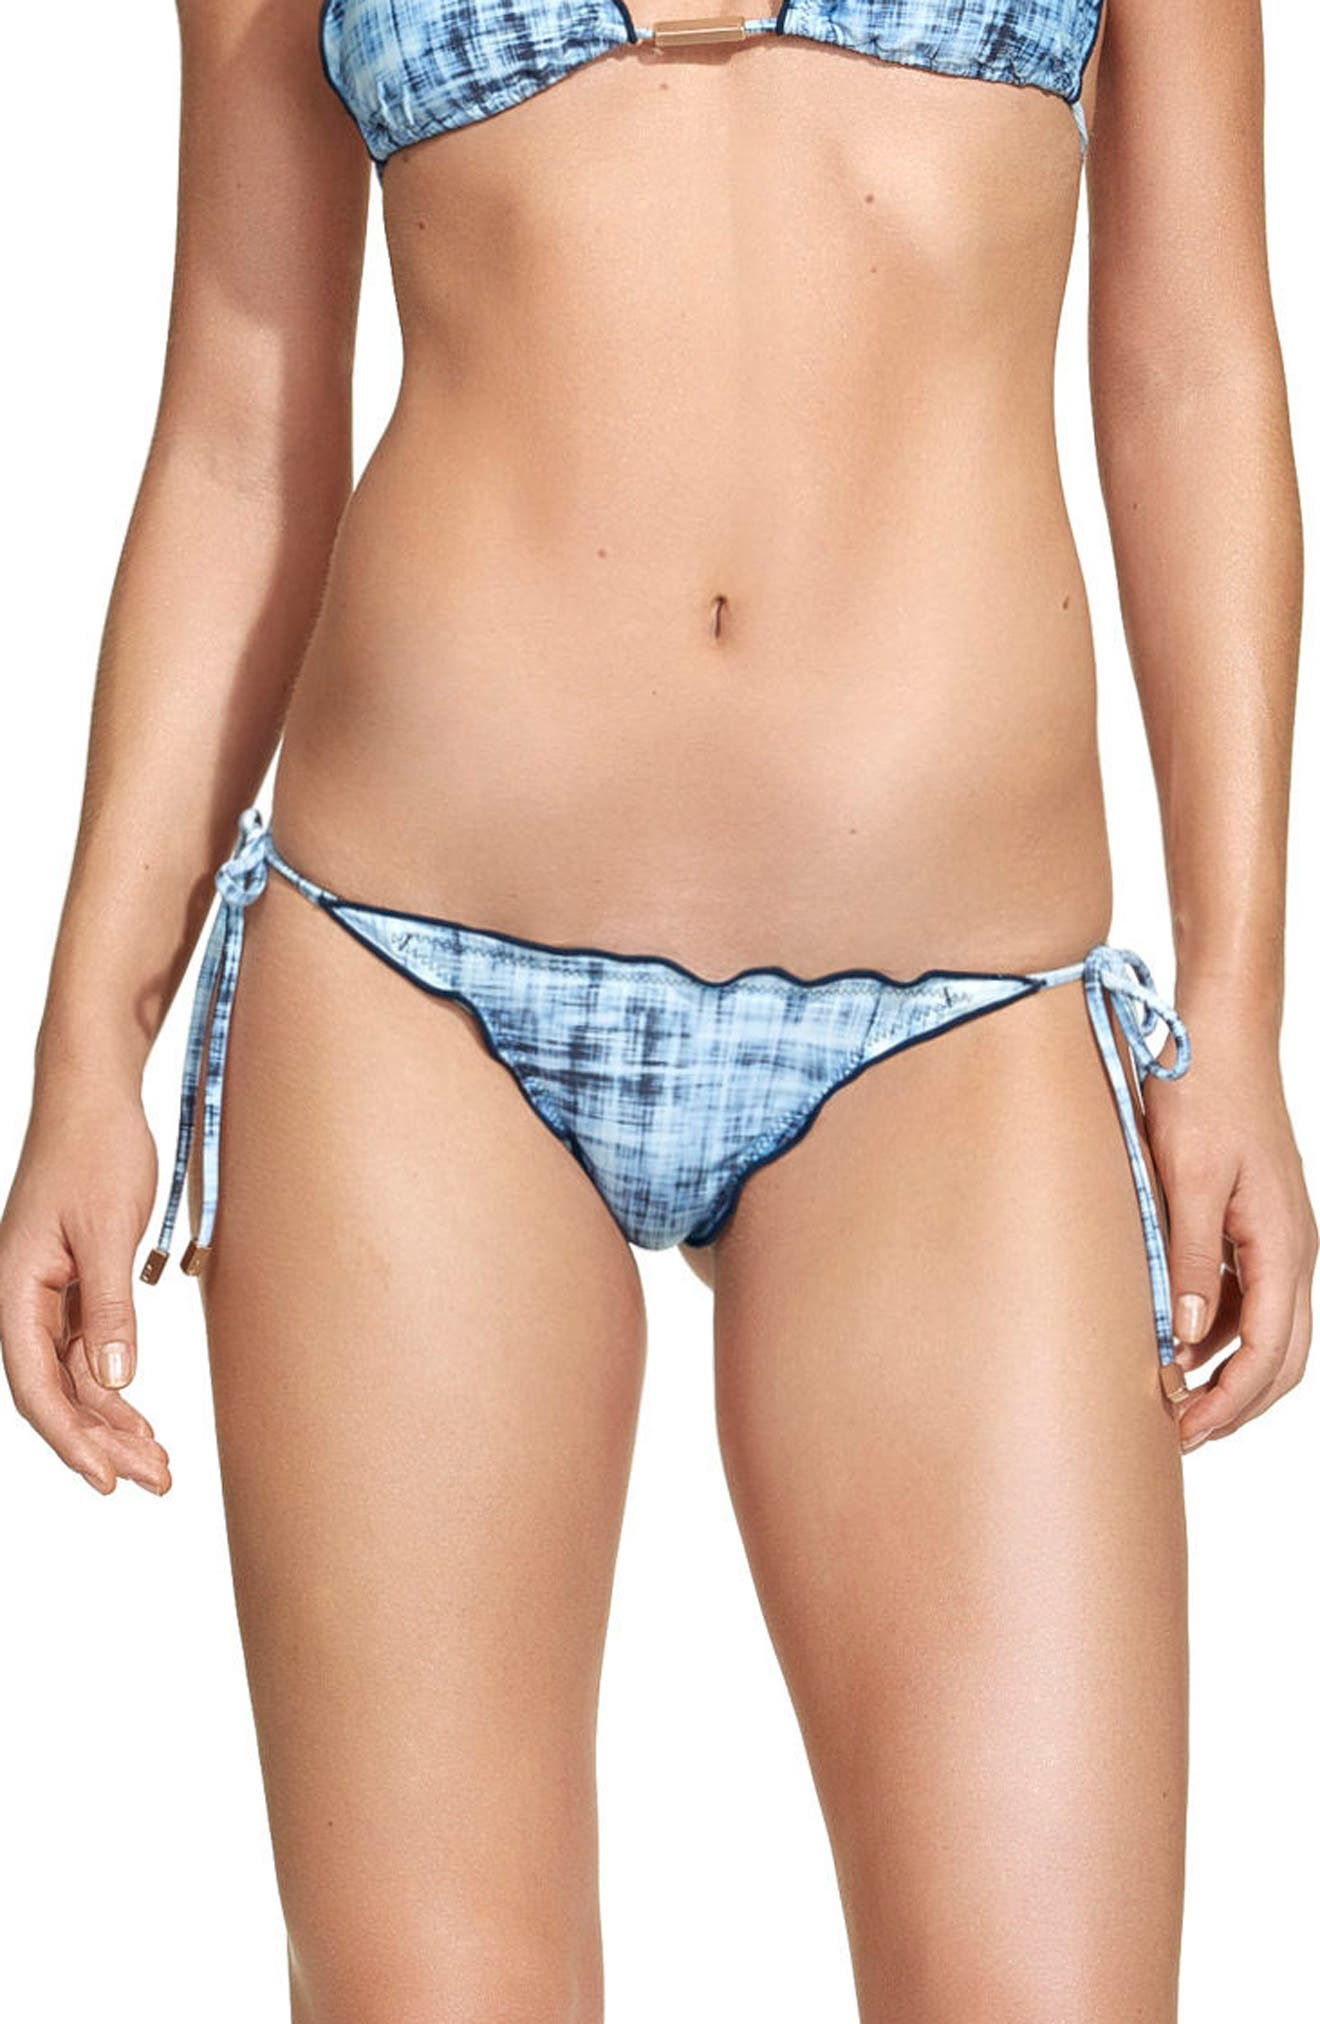 Rustic Ripple Side Tie Bikini Bottoms,                             Alternate thumbnail 2, color,                             Blue